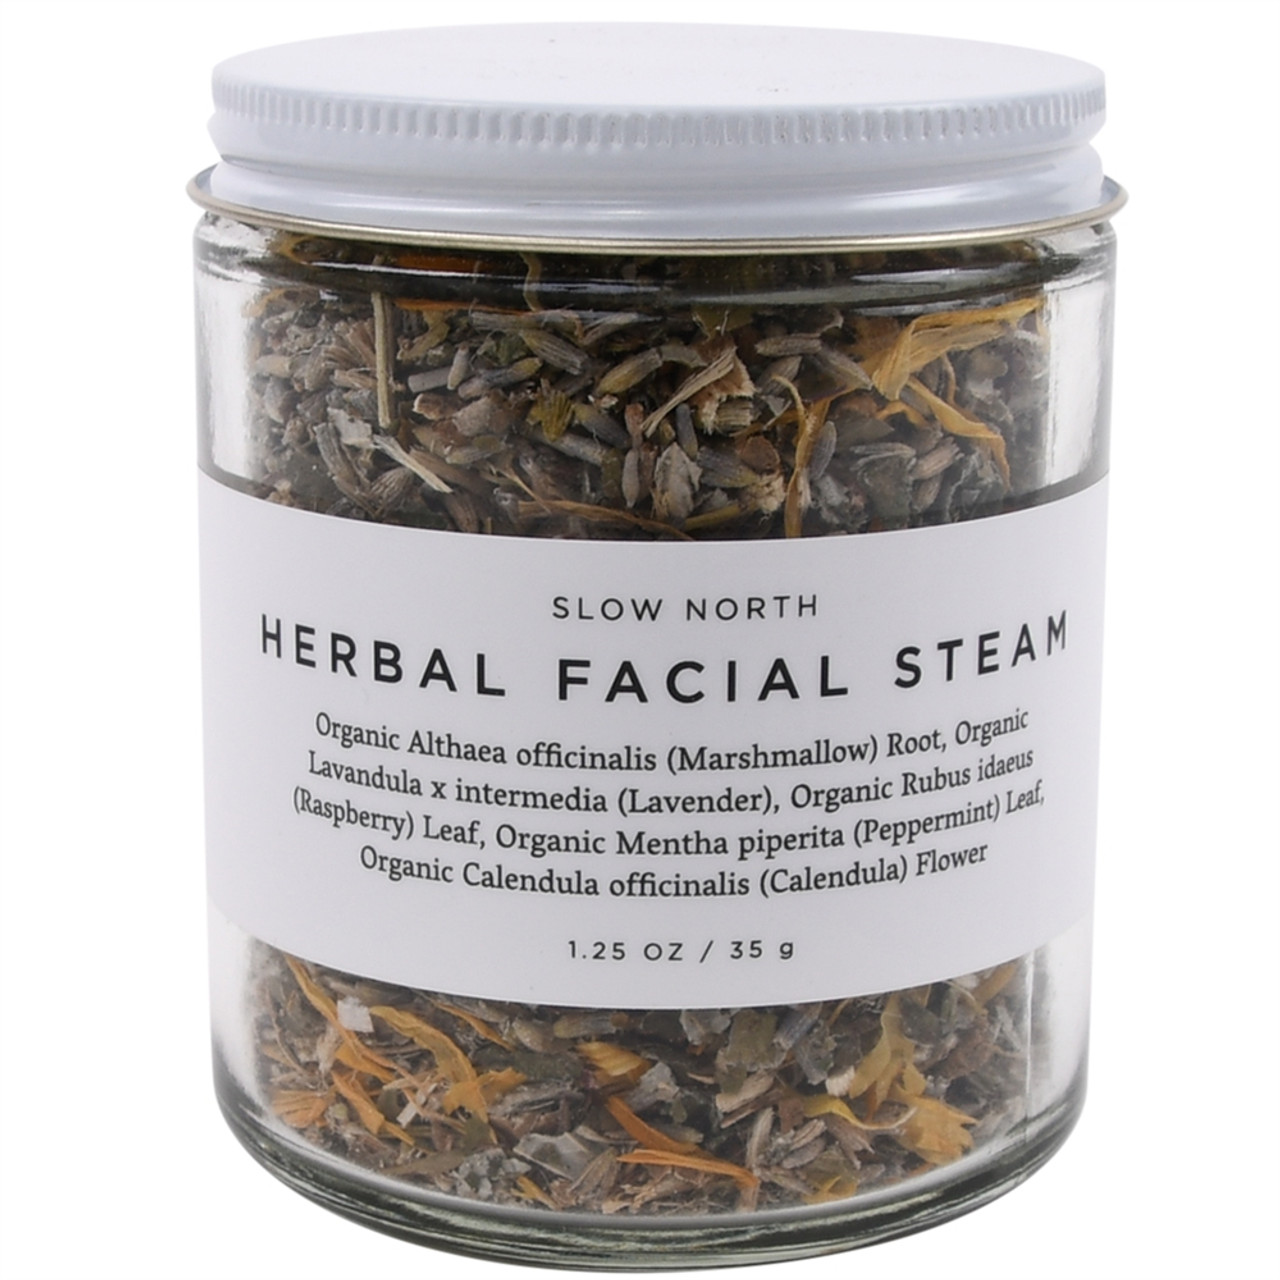 Organic Herbal Facial Steam - Calm & Soothe